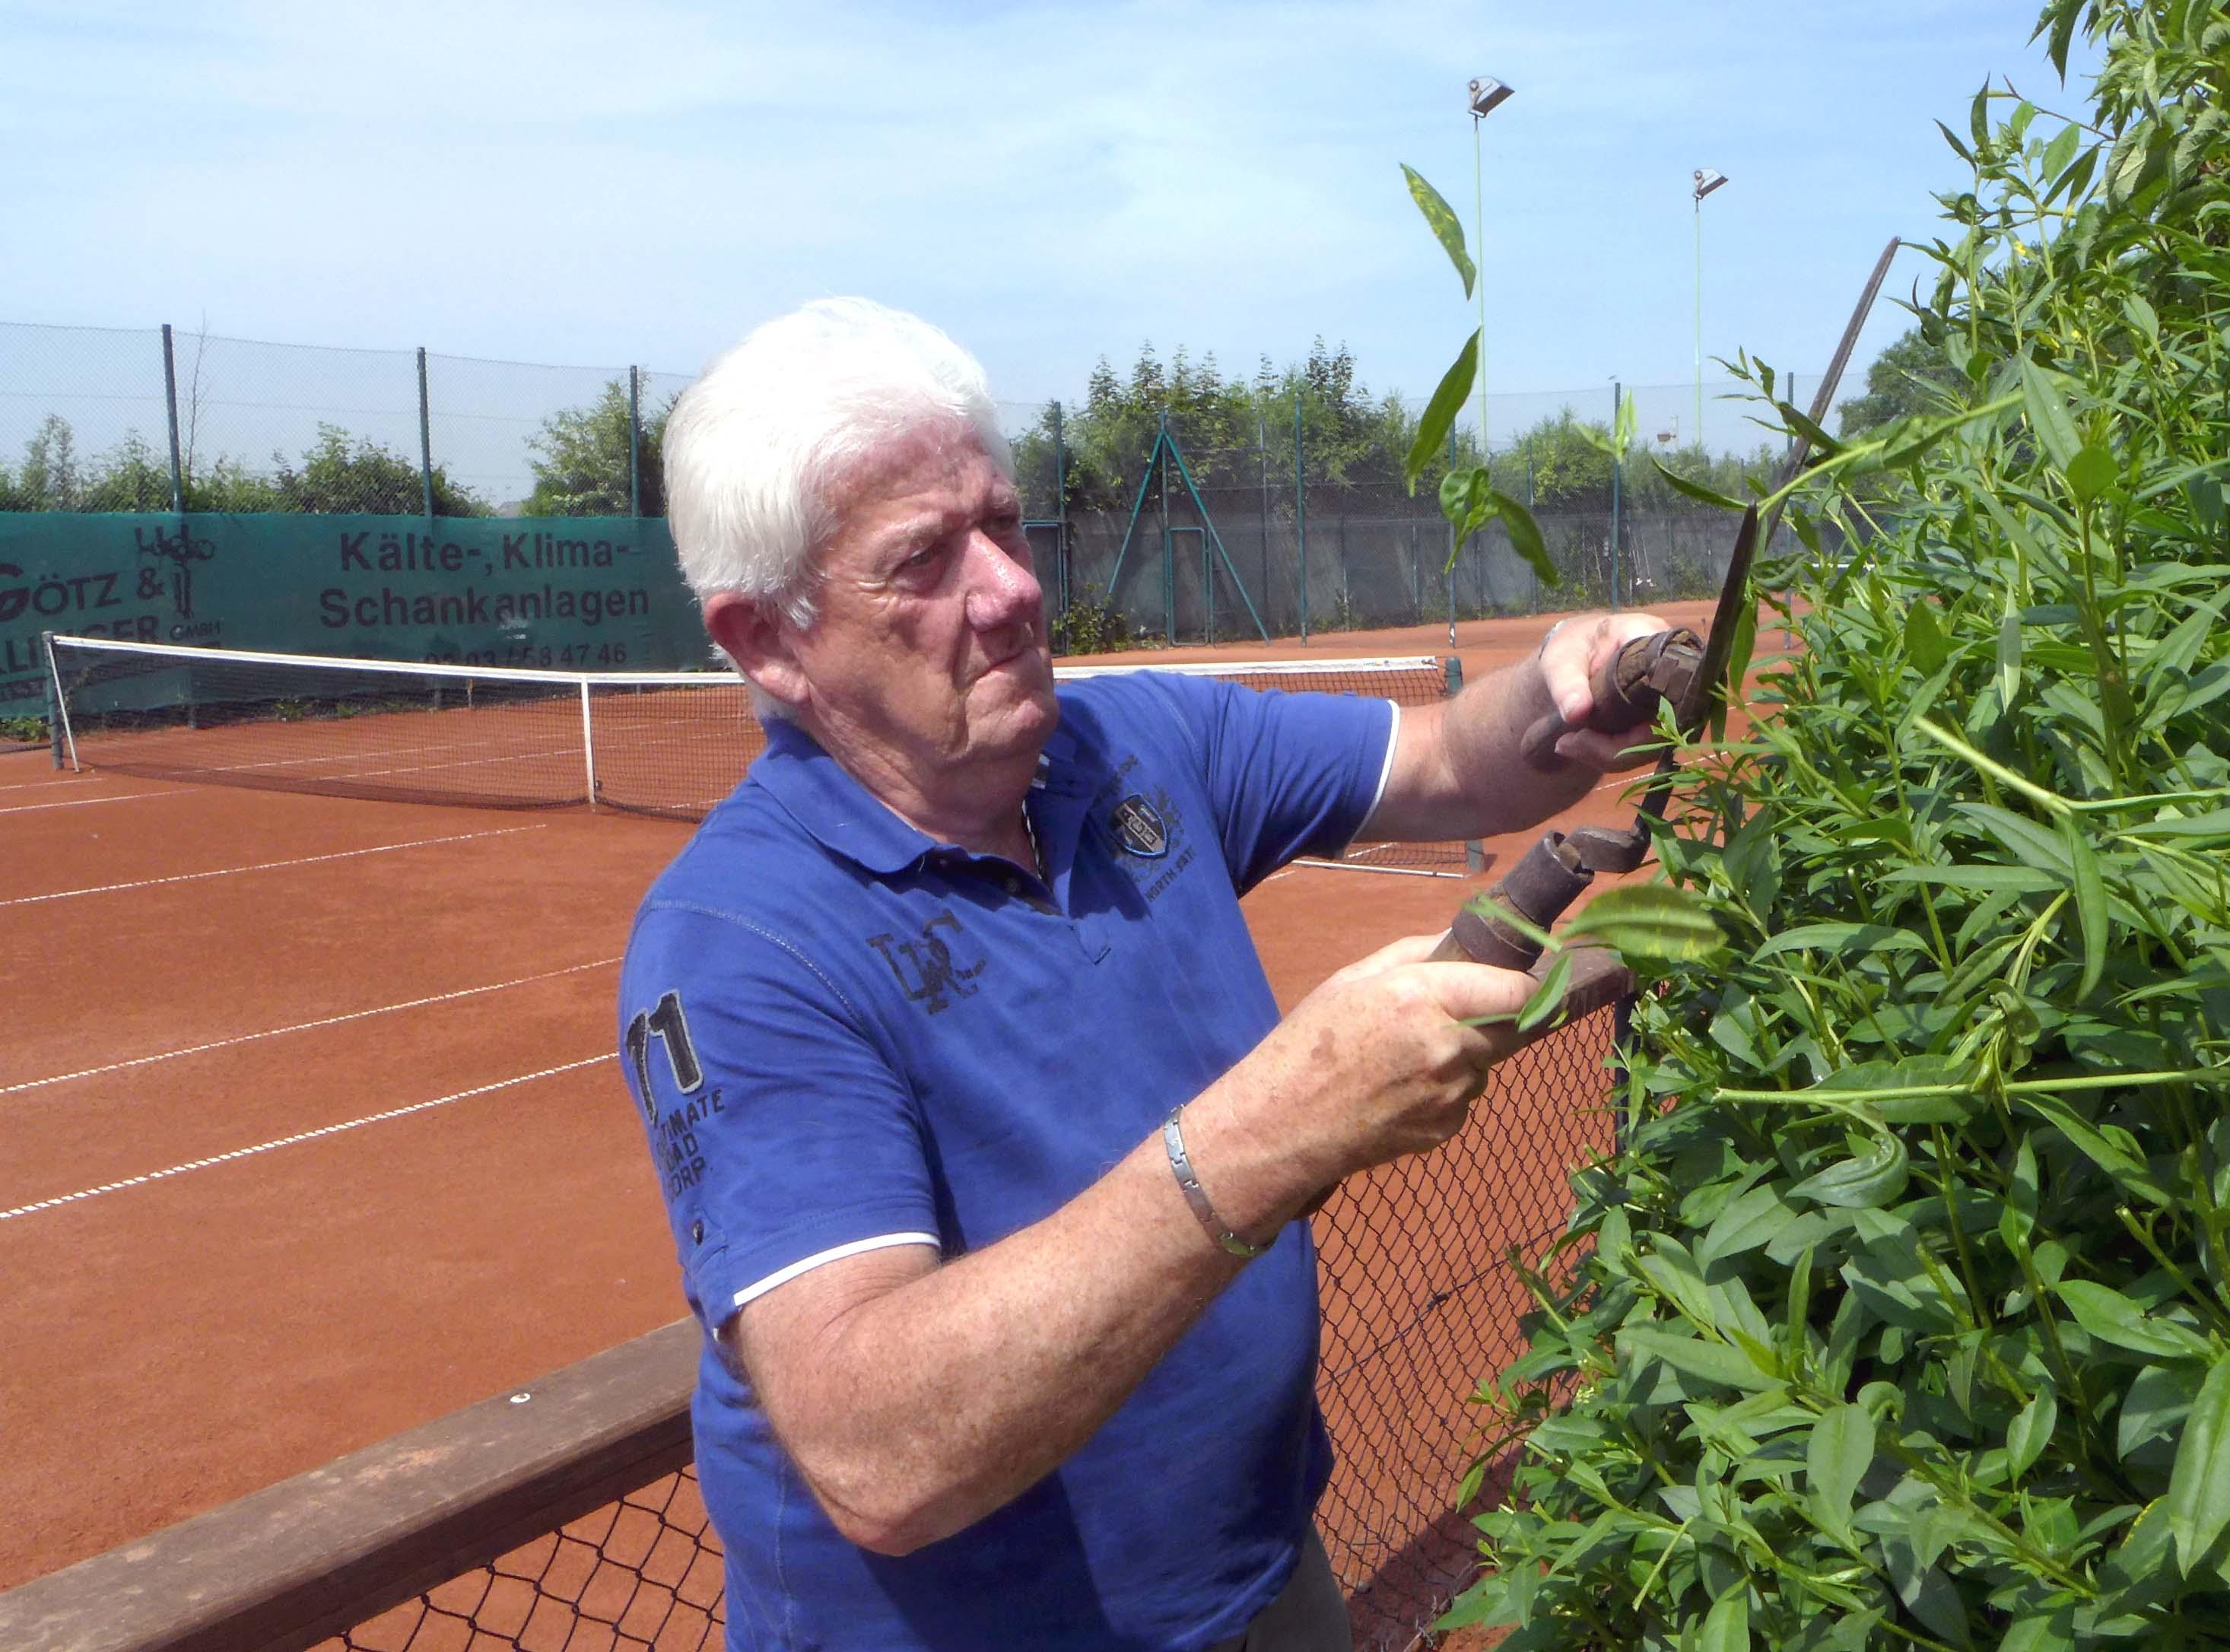 tennis-platzwart